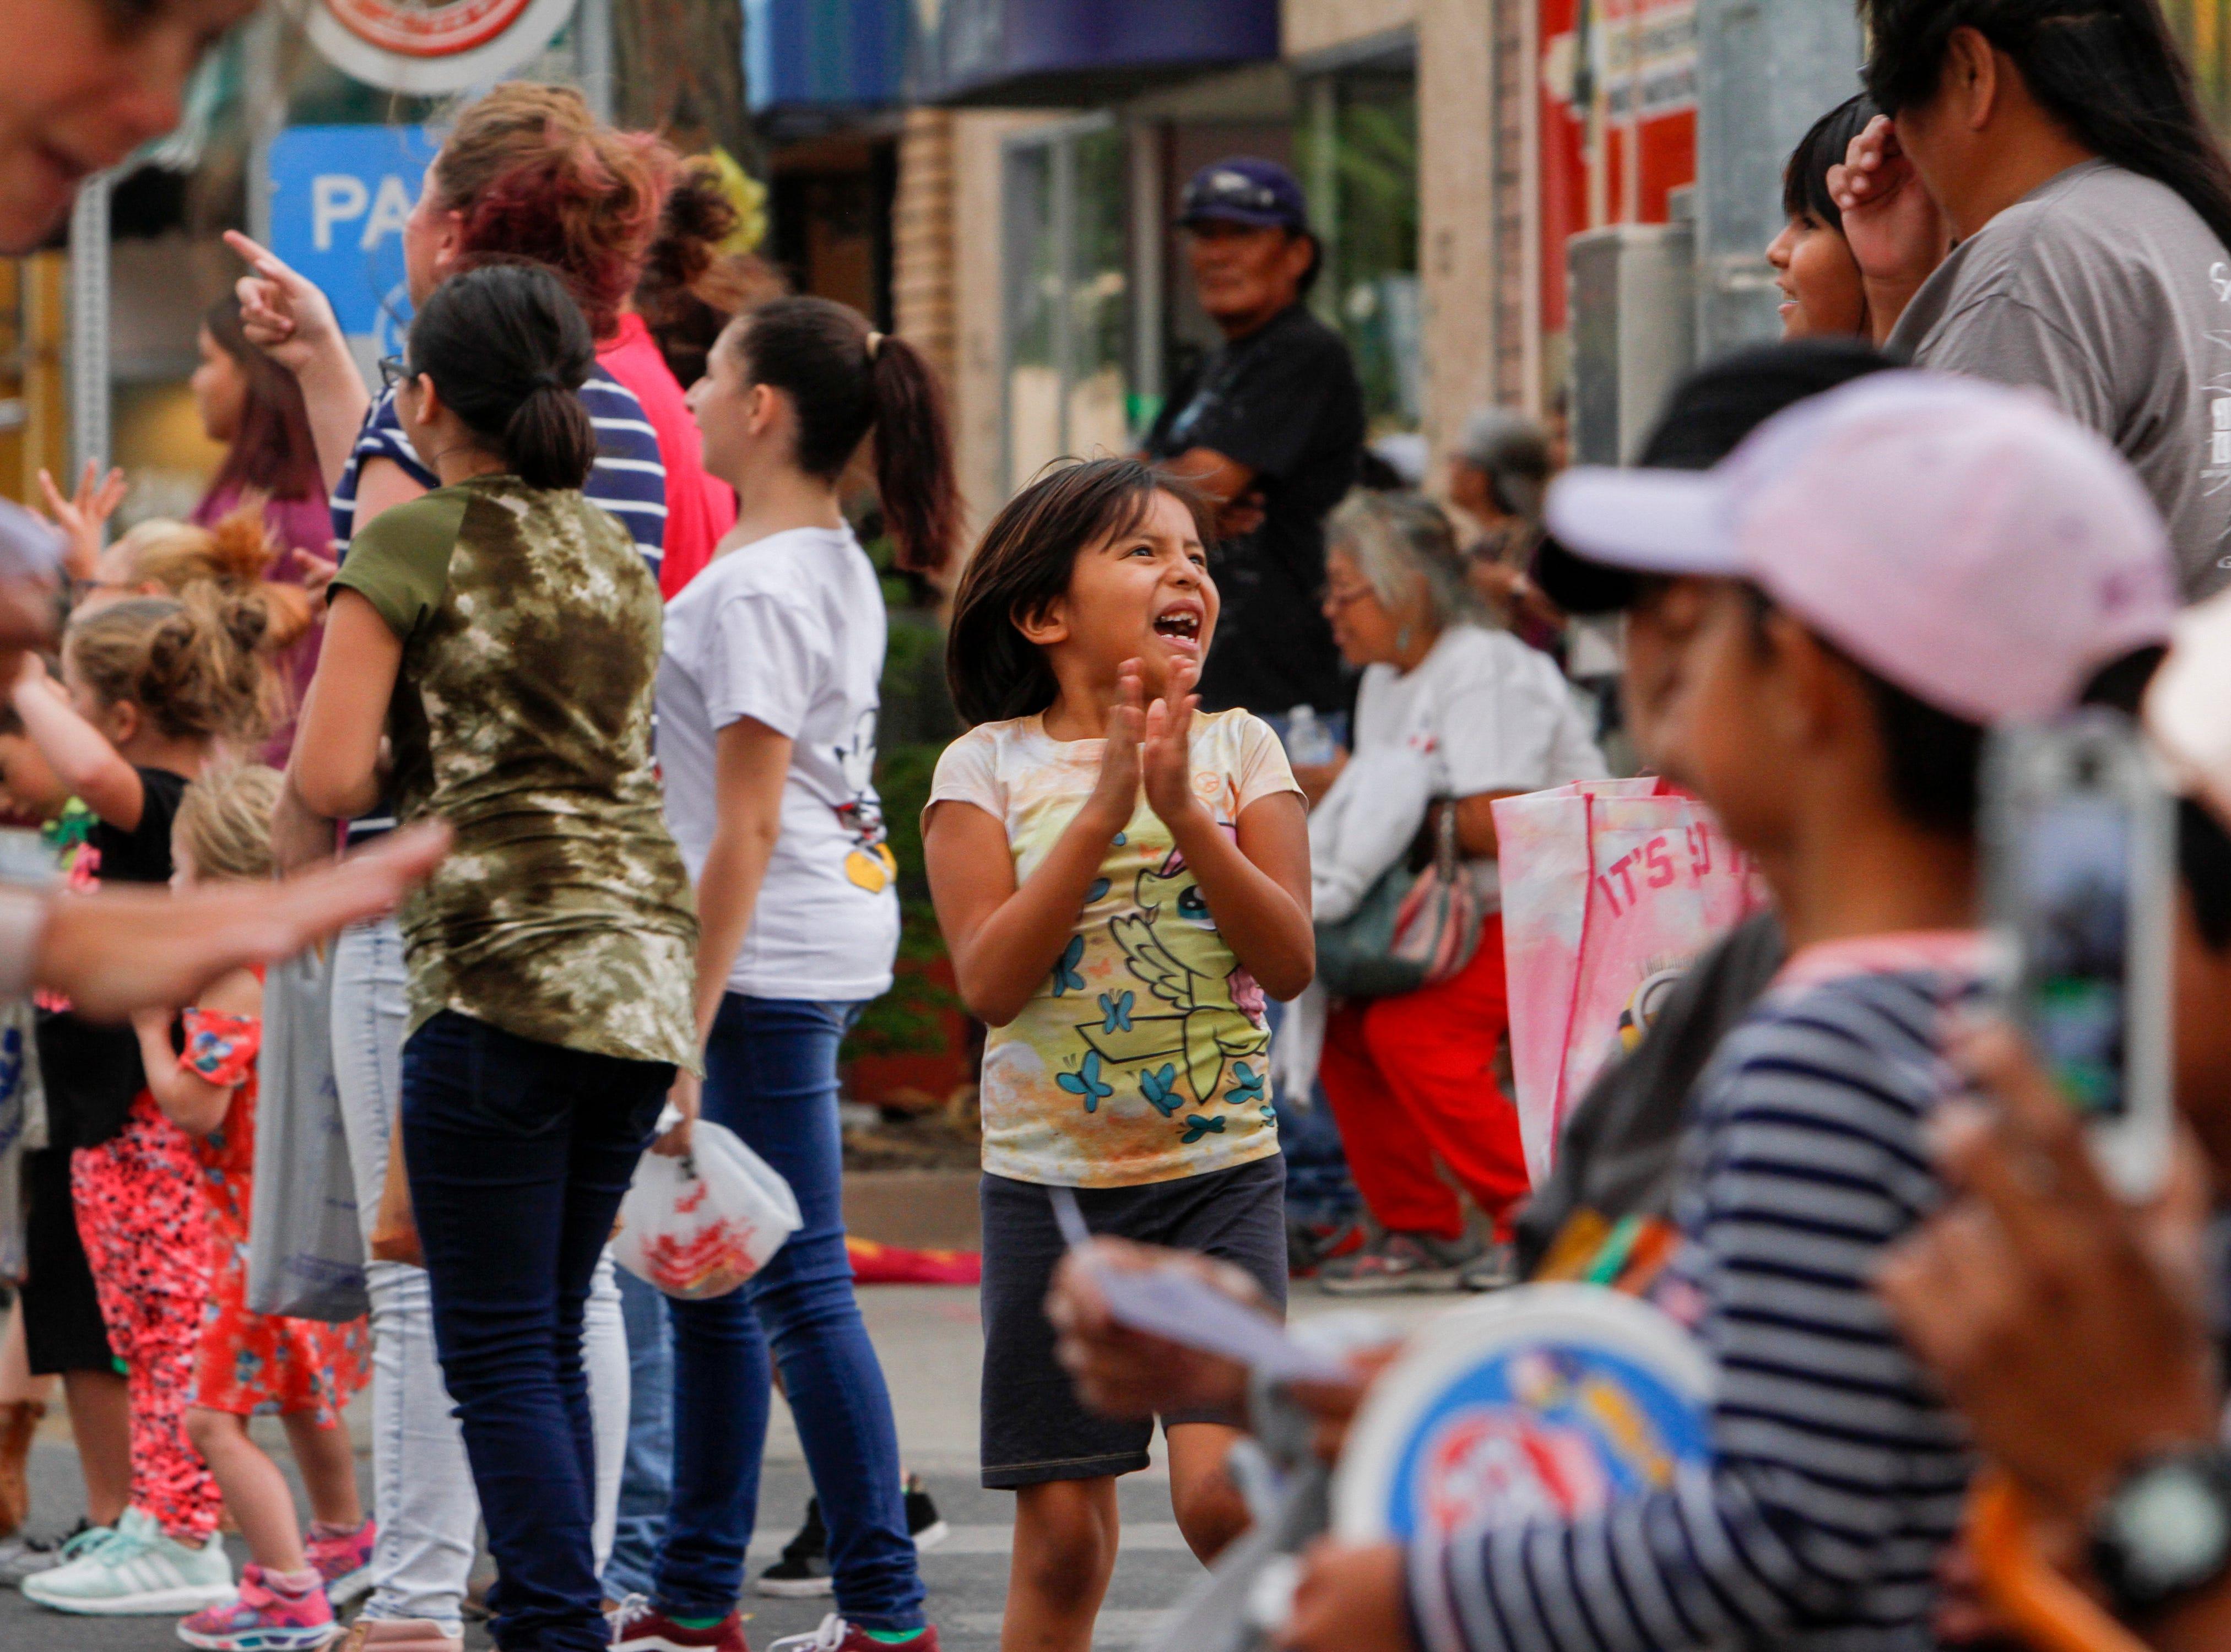 Community members enjoy the San Juan County Fair Parade, Friday, Aug. 10, 2018  on Main Street in Farmington.